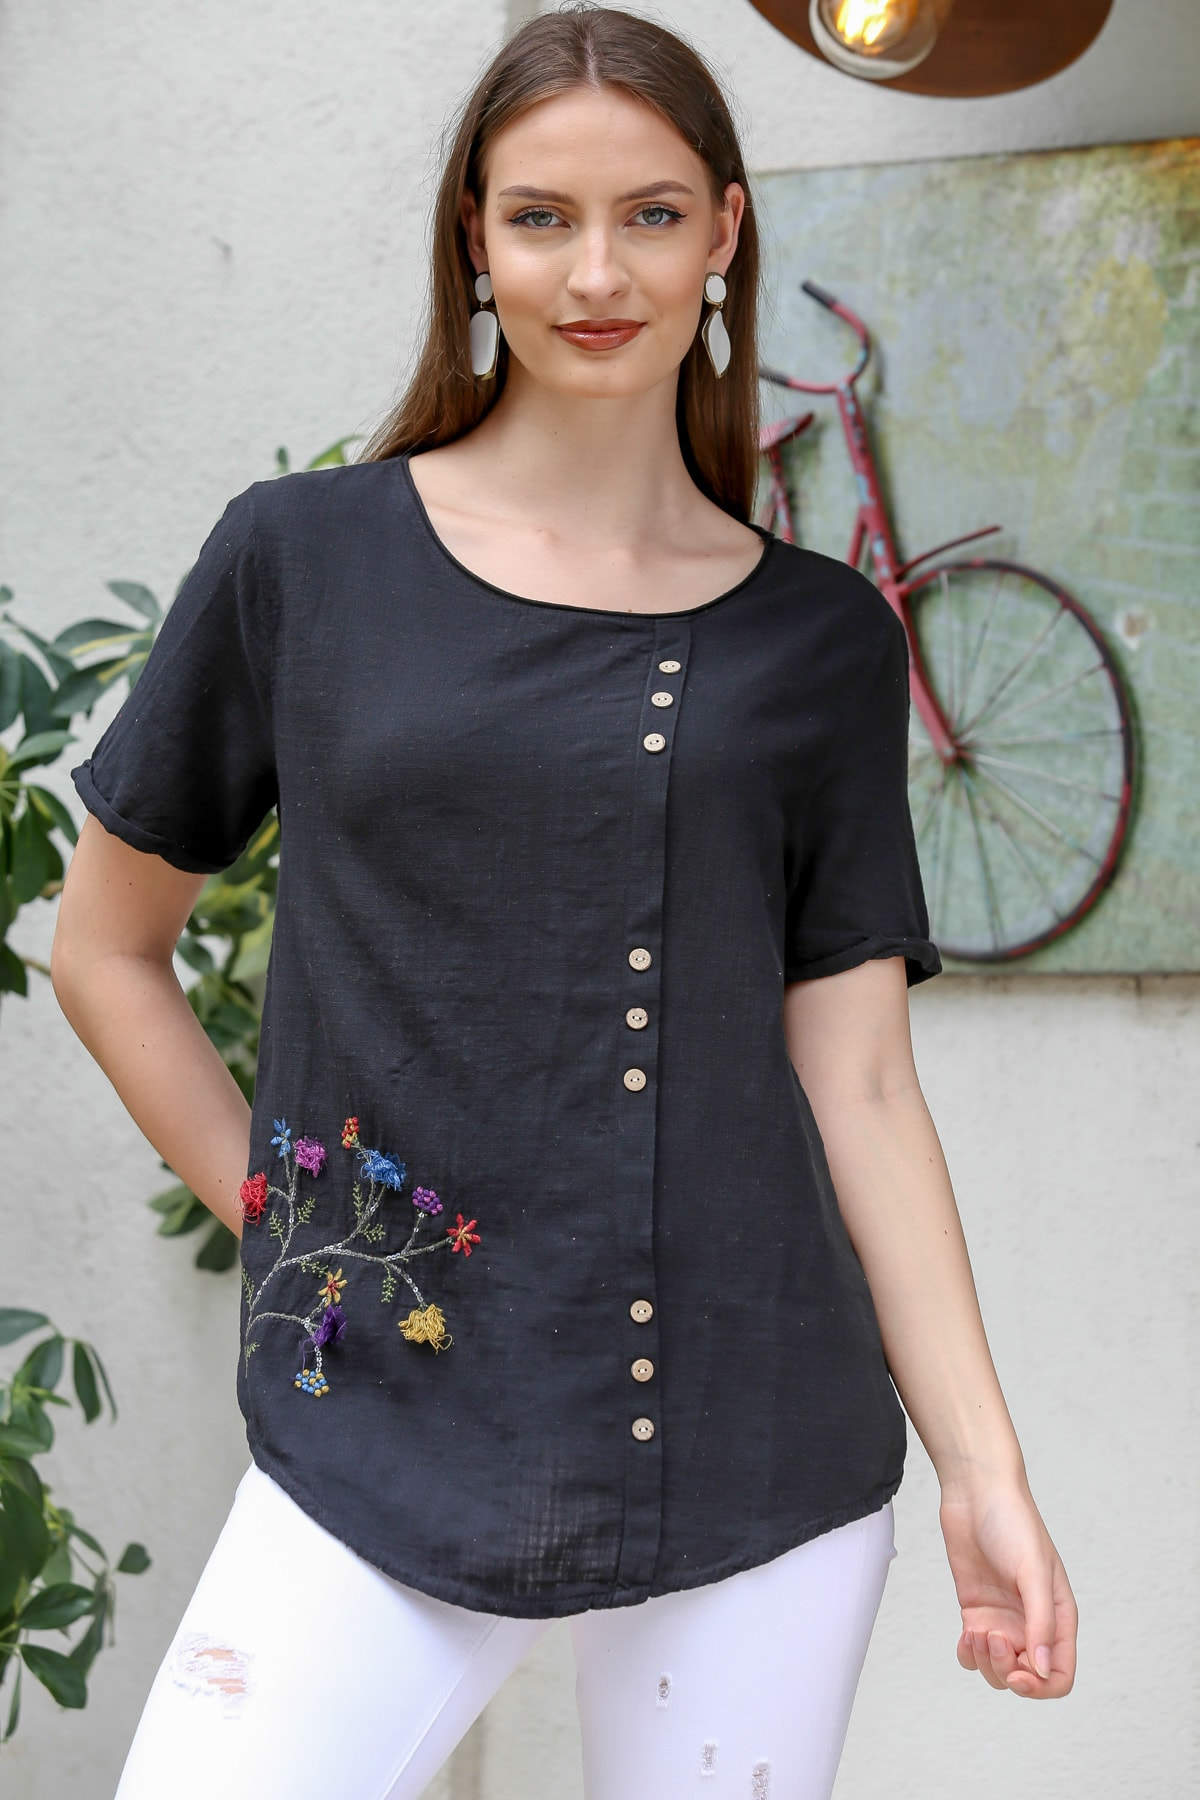 Chiccy Kadın Siyah Çiçek Buketi 3D Nakışlı Düğme Detaylı Salaş Dokuma Bluz M10010200BL95280